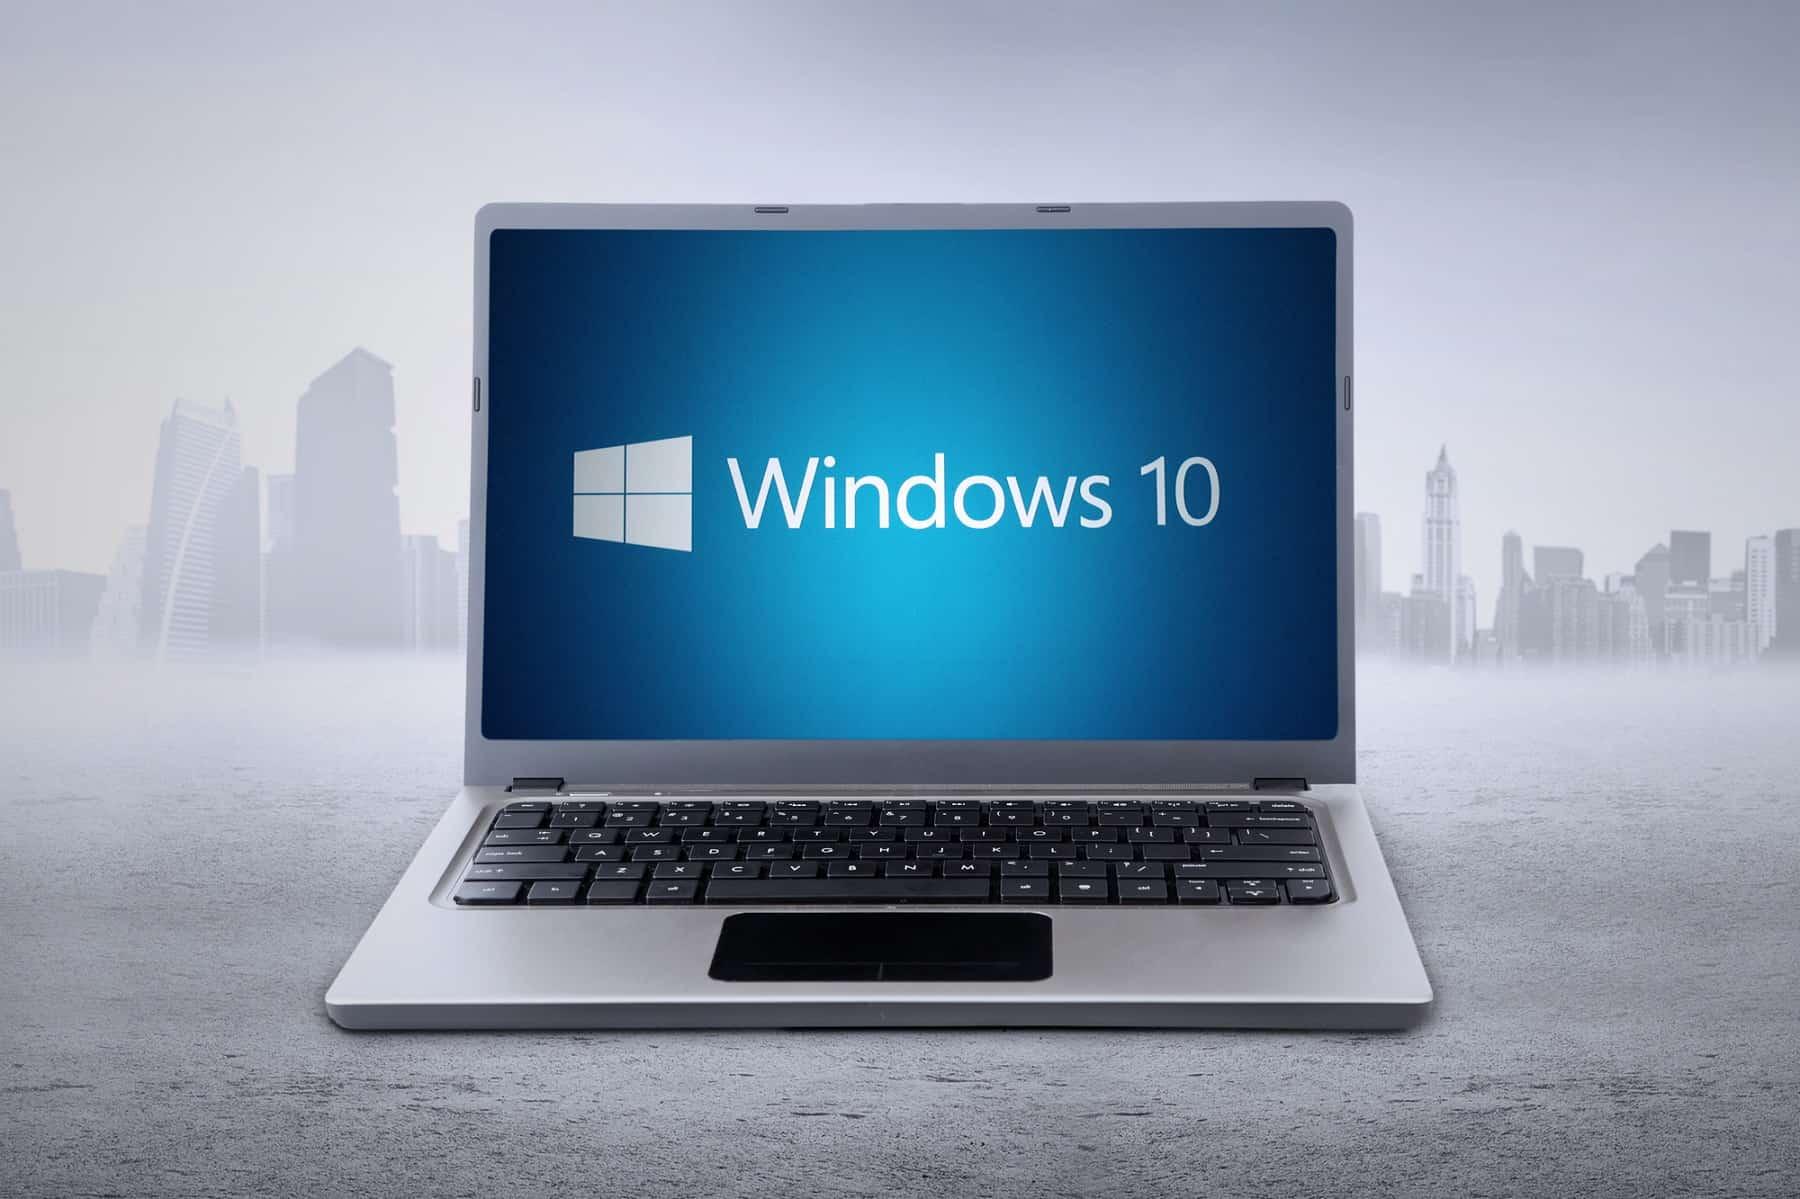 Windows 10 version 2004 reduced manual postponements of Windows updates...